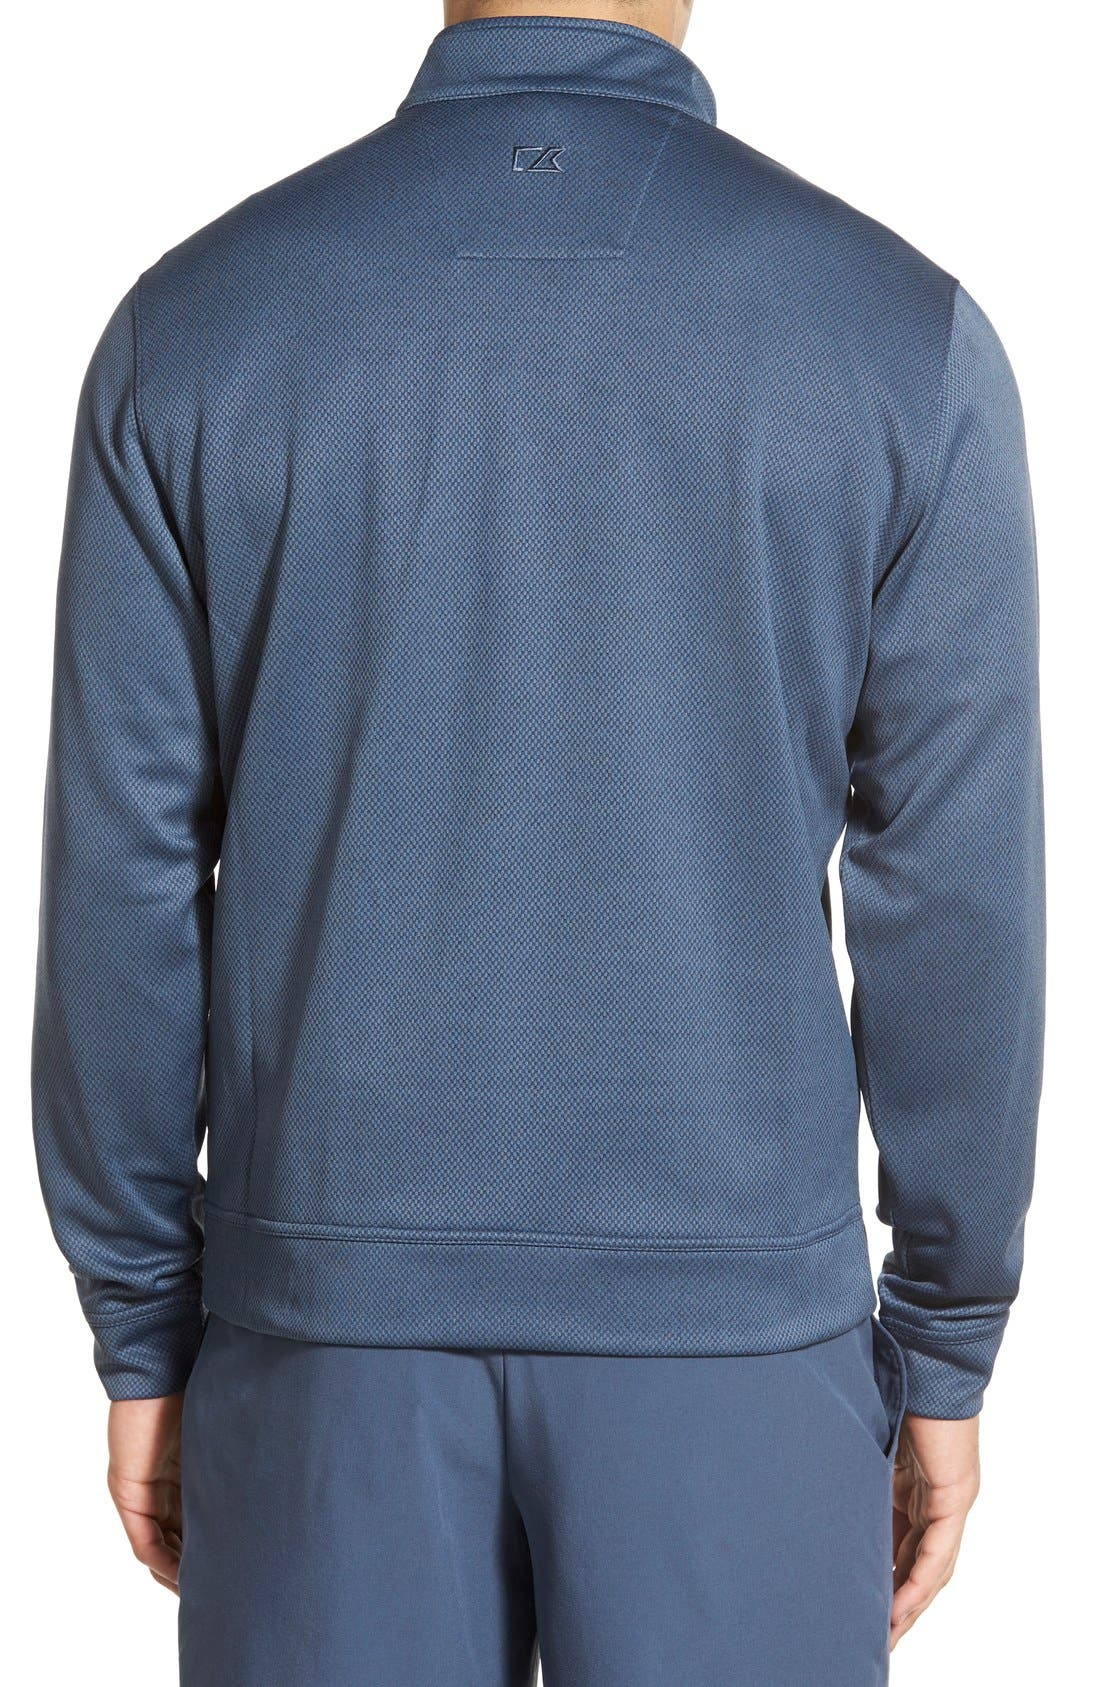 'Weather Tec Orbit' Half Zip Pullover,                             Alternate thumbnail 5, color,                             015